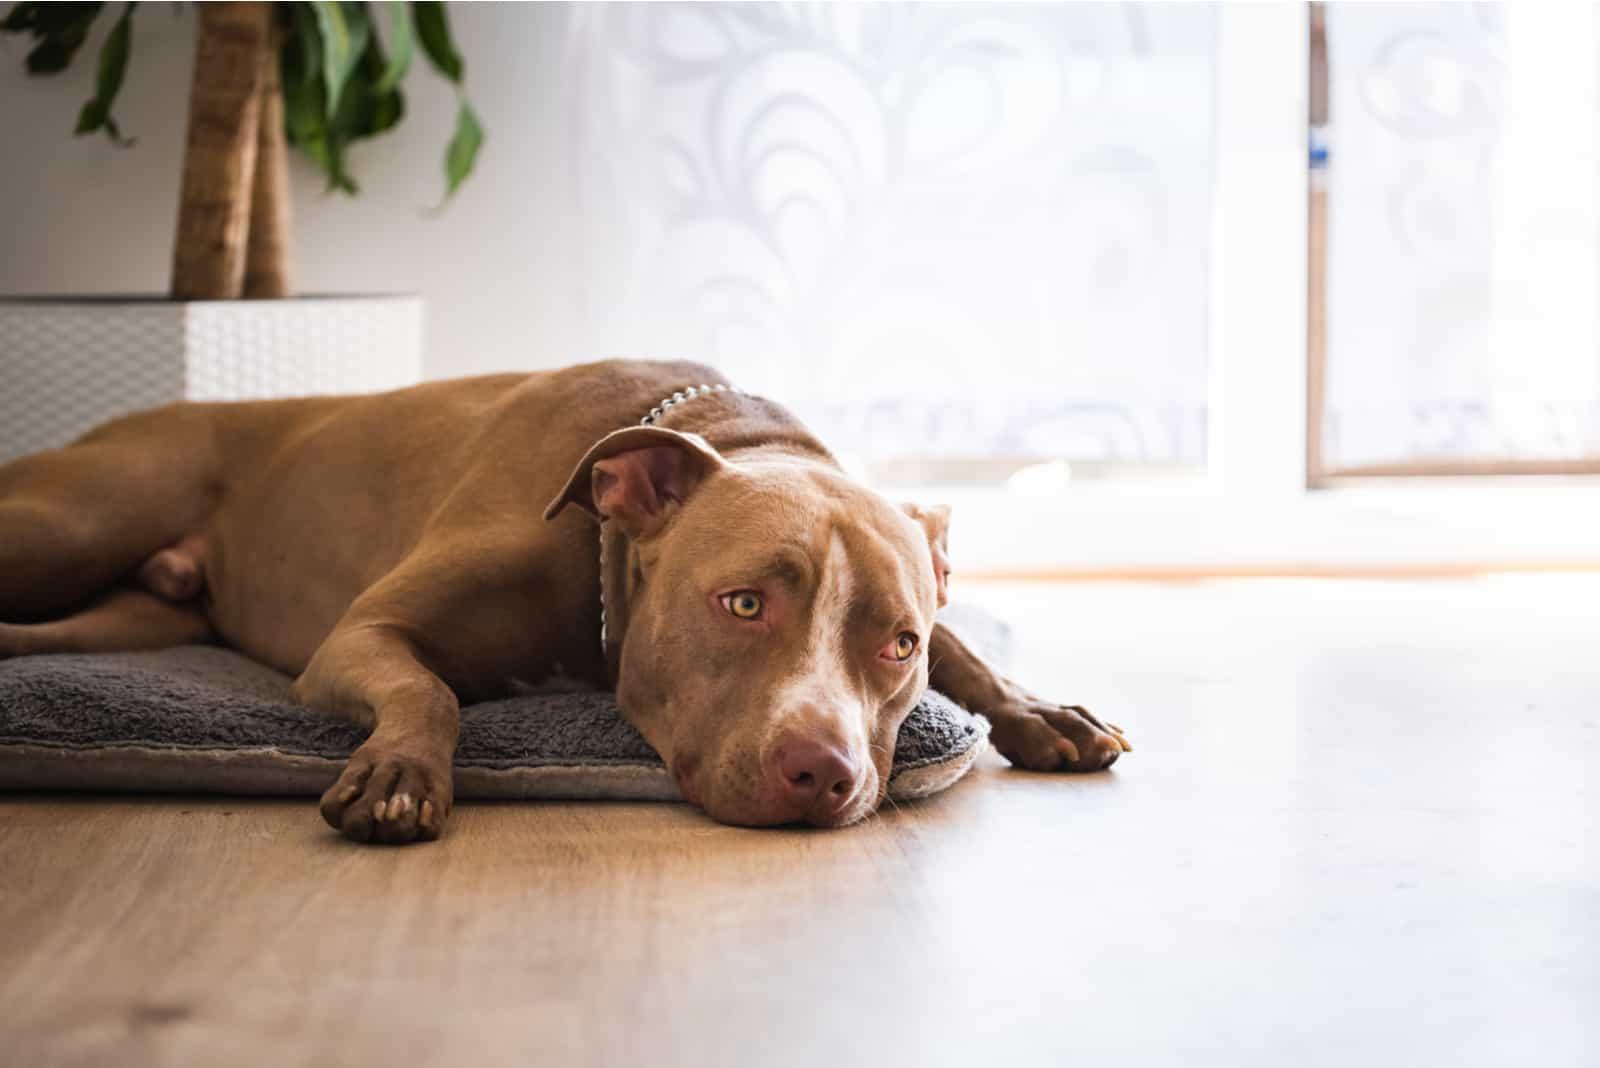 Dog lying on wooden floor indoors